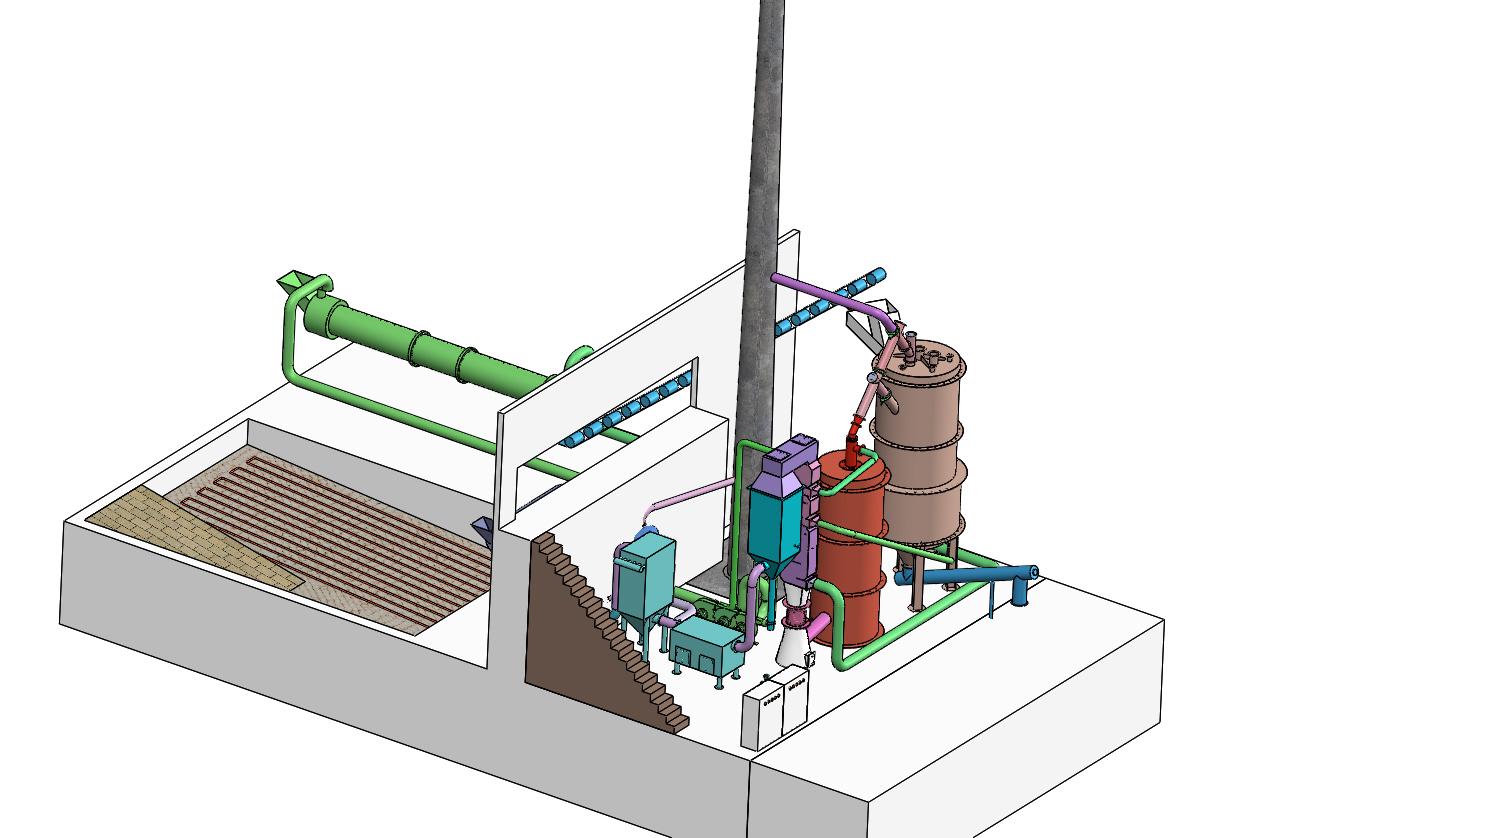 RTO焚烧炉系统安全控制方式,该怎样避免安全事故的产生